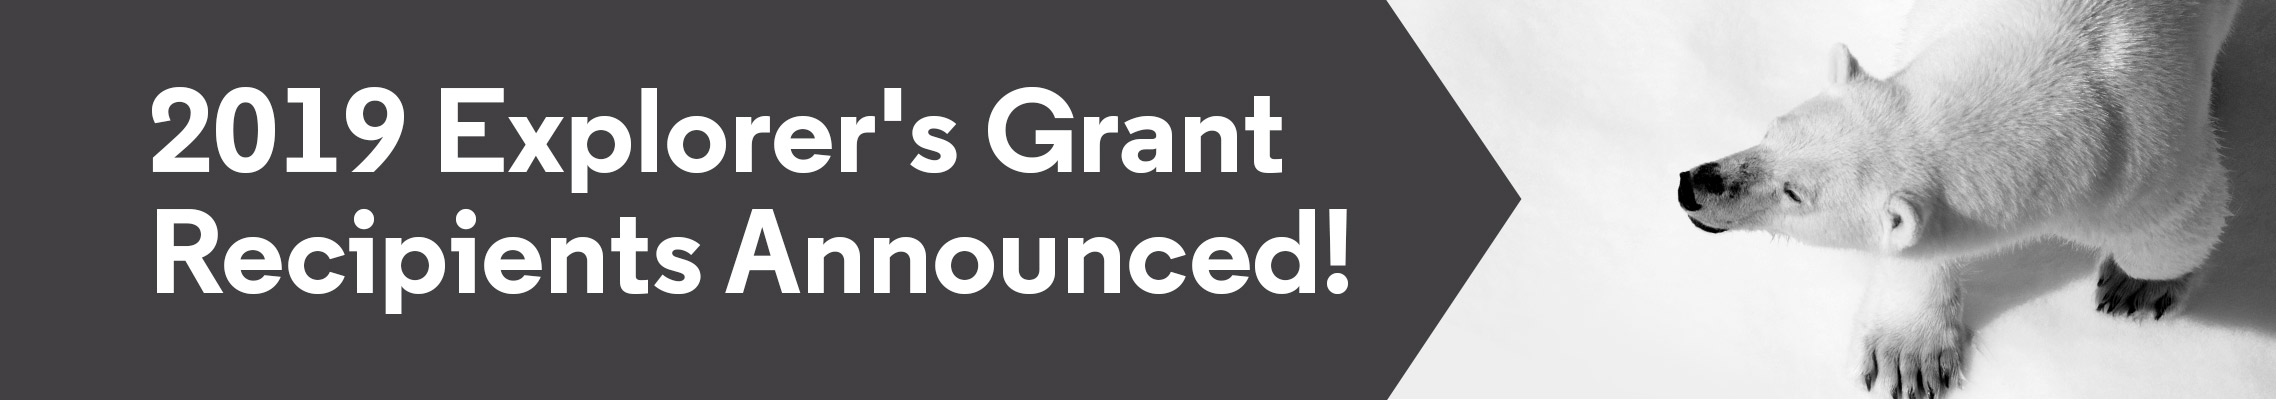 2019 Explorer's Grant Recipients Announced!